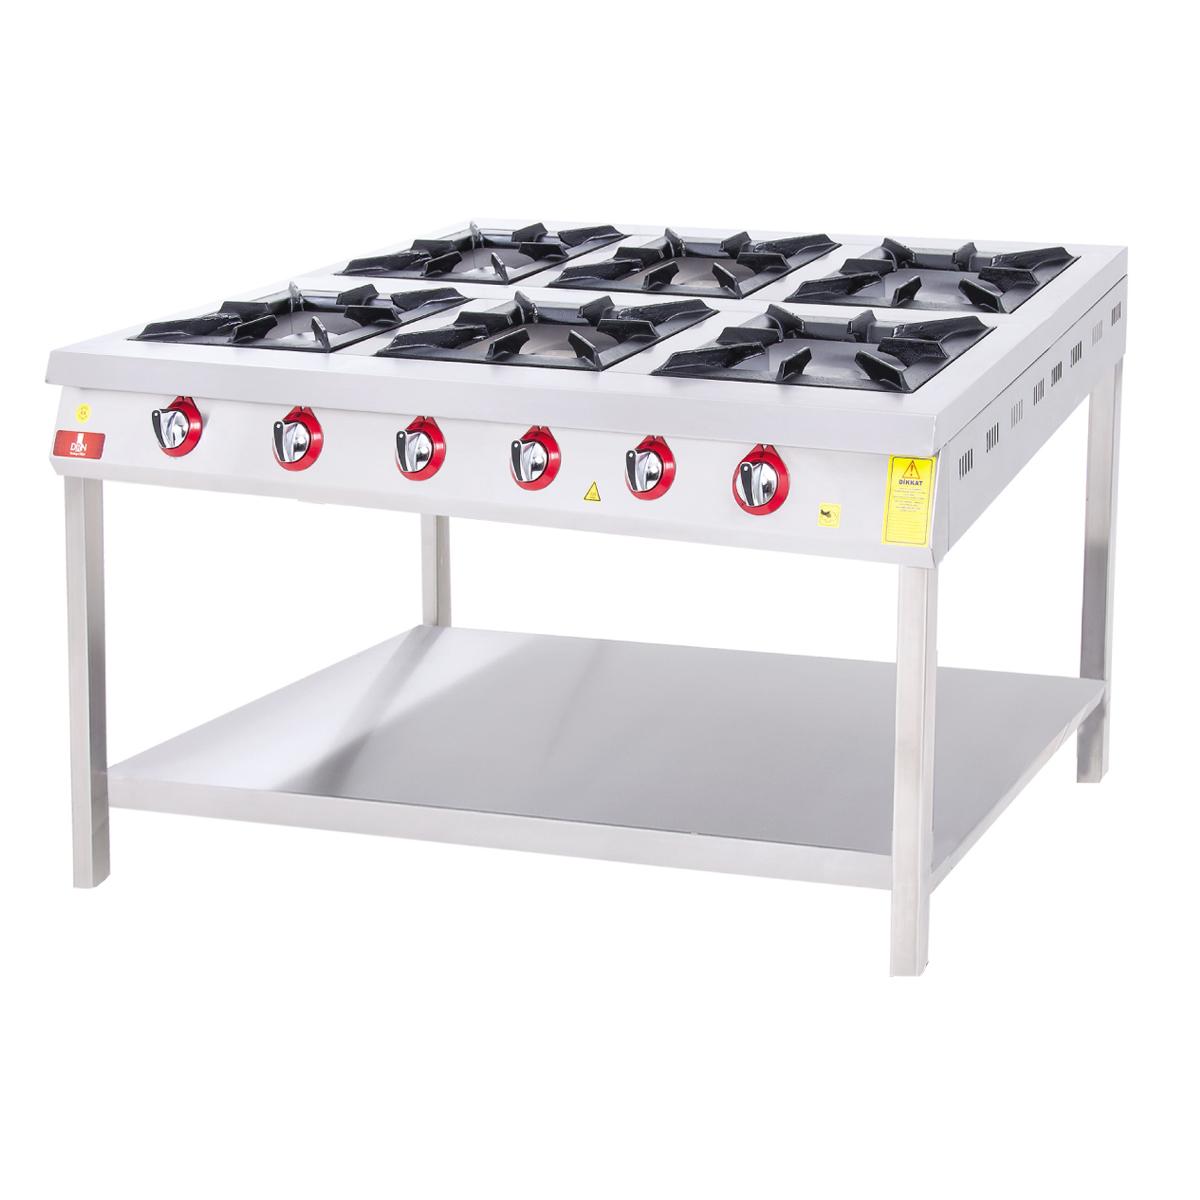 Range and Bottom-Shelf - 6 Burners - 130x80 - Gas